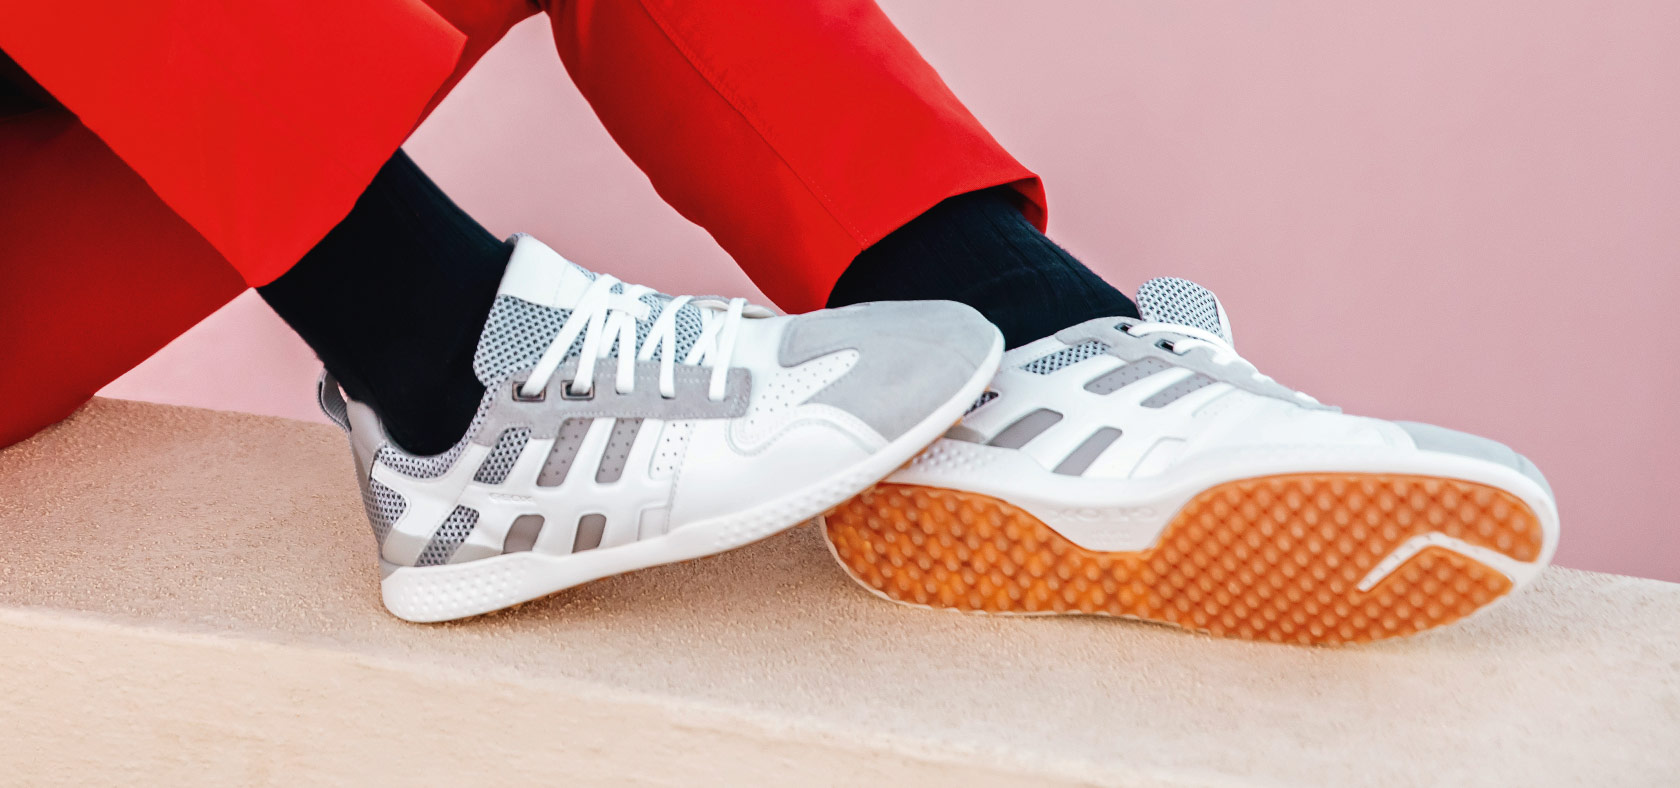 Scarpe Sneakers da Uomo Traspiranti | Geox